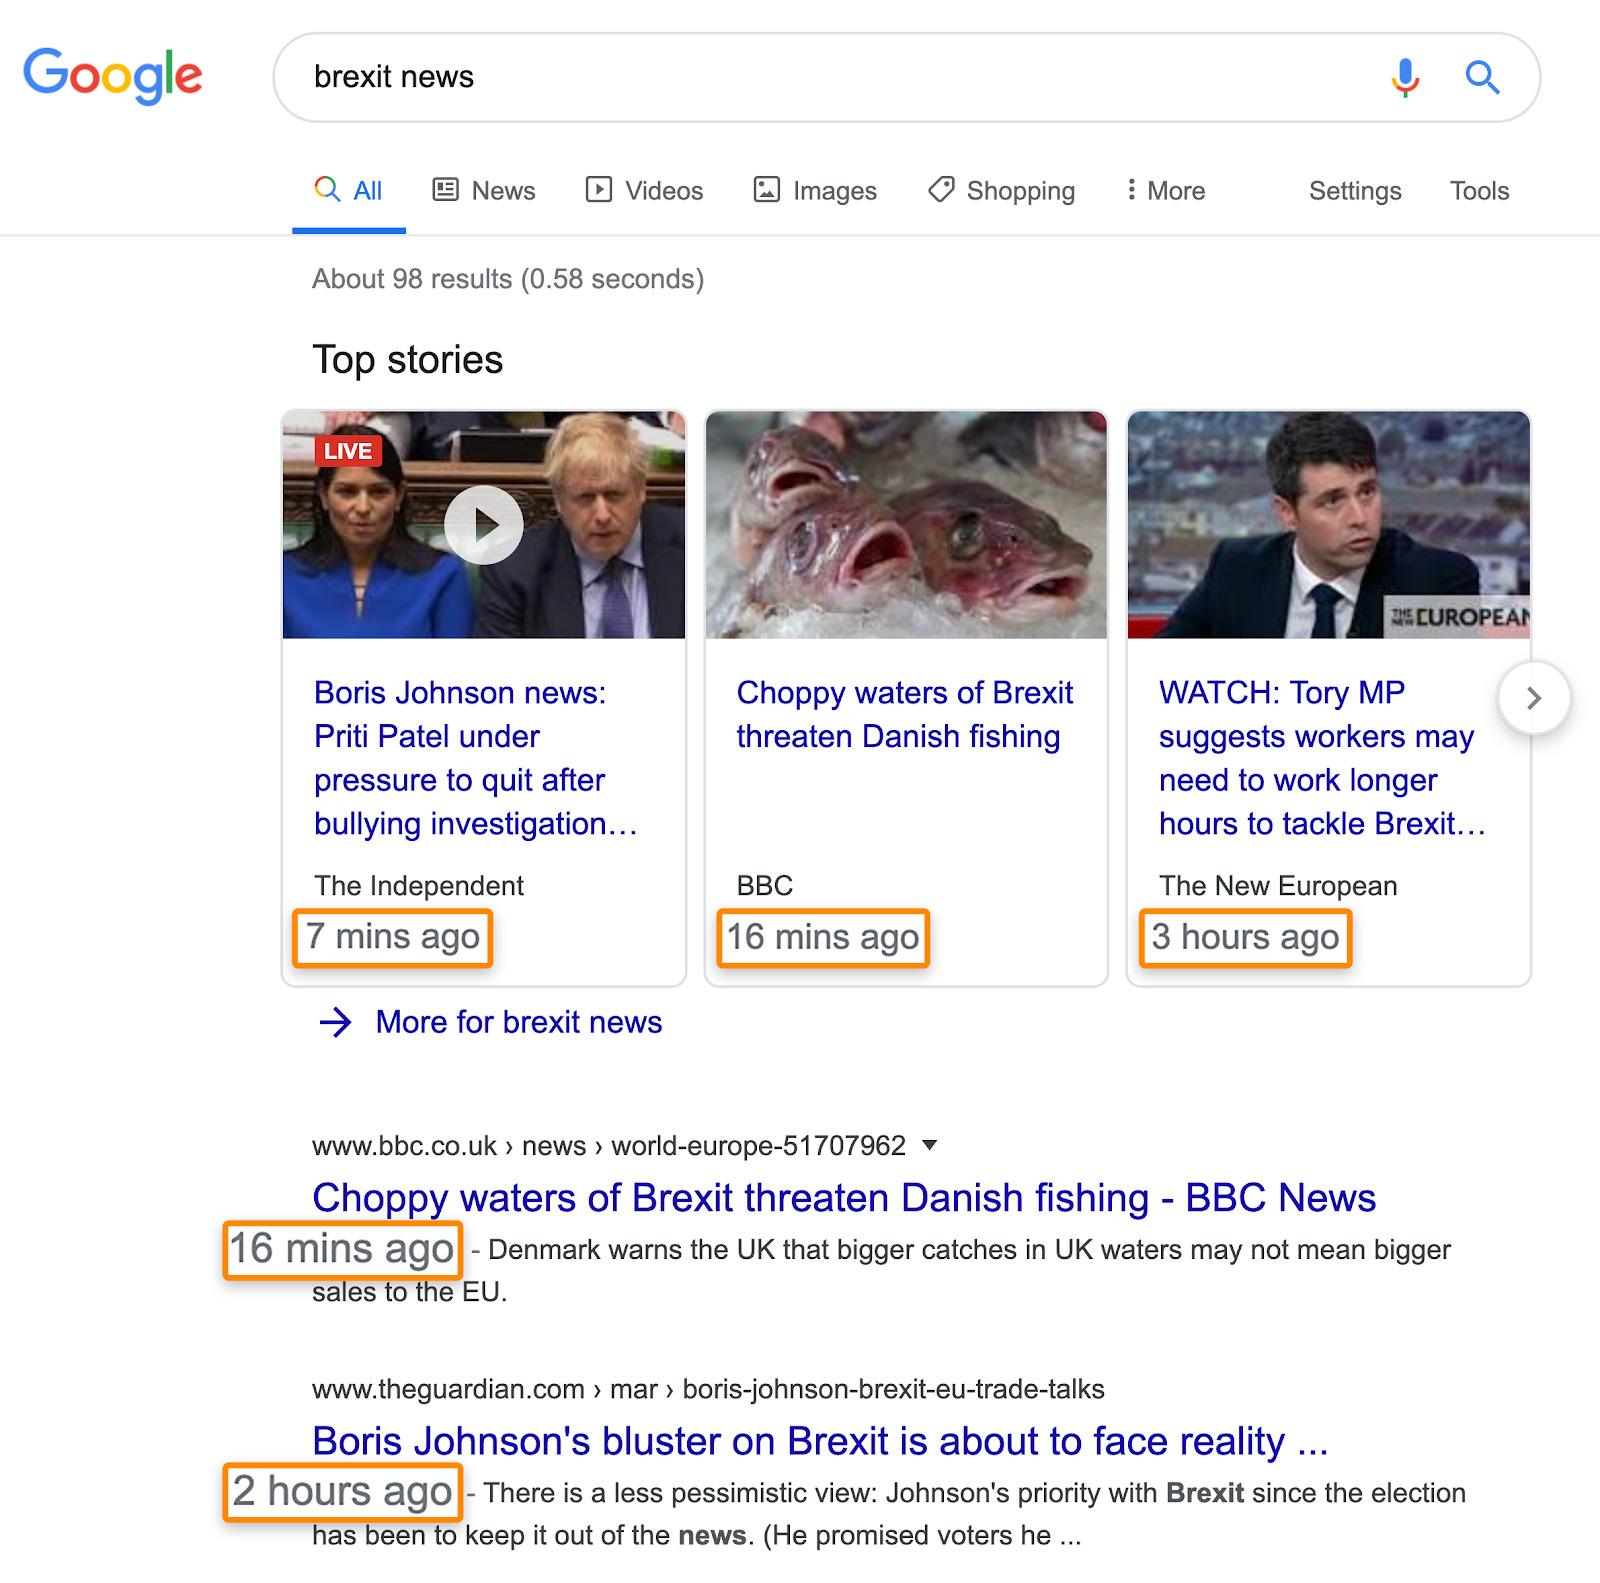 2 brexit news top stories